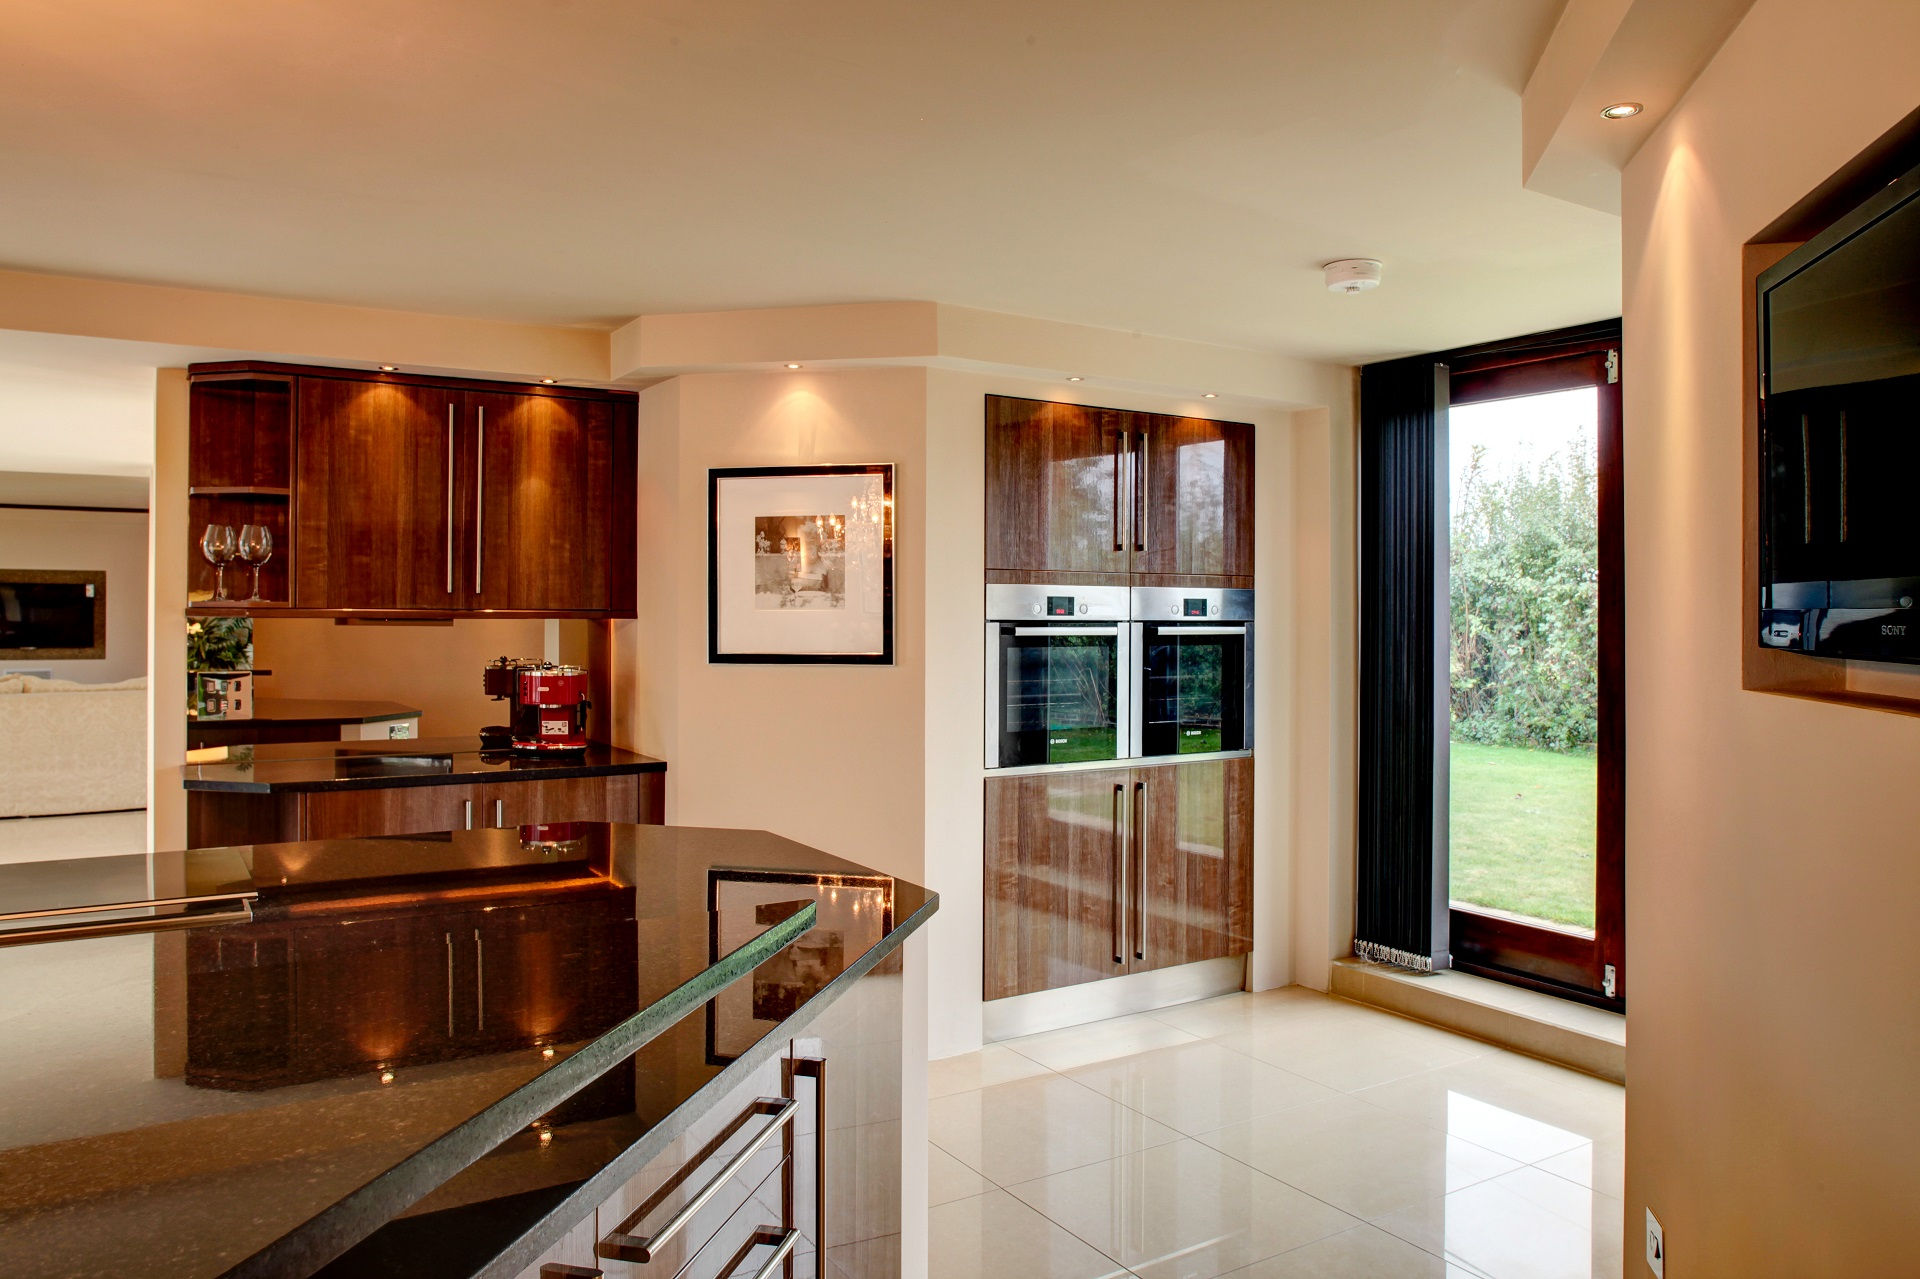 fern hill, nottingham, designer kitchen